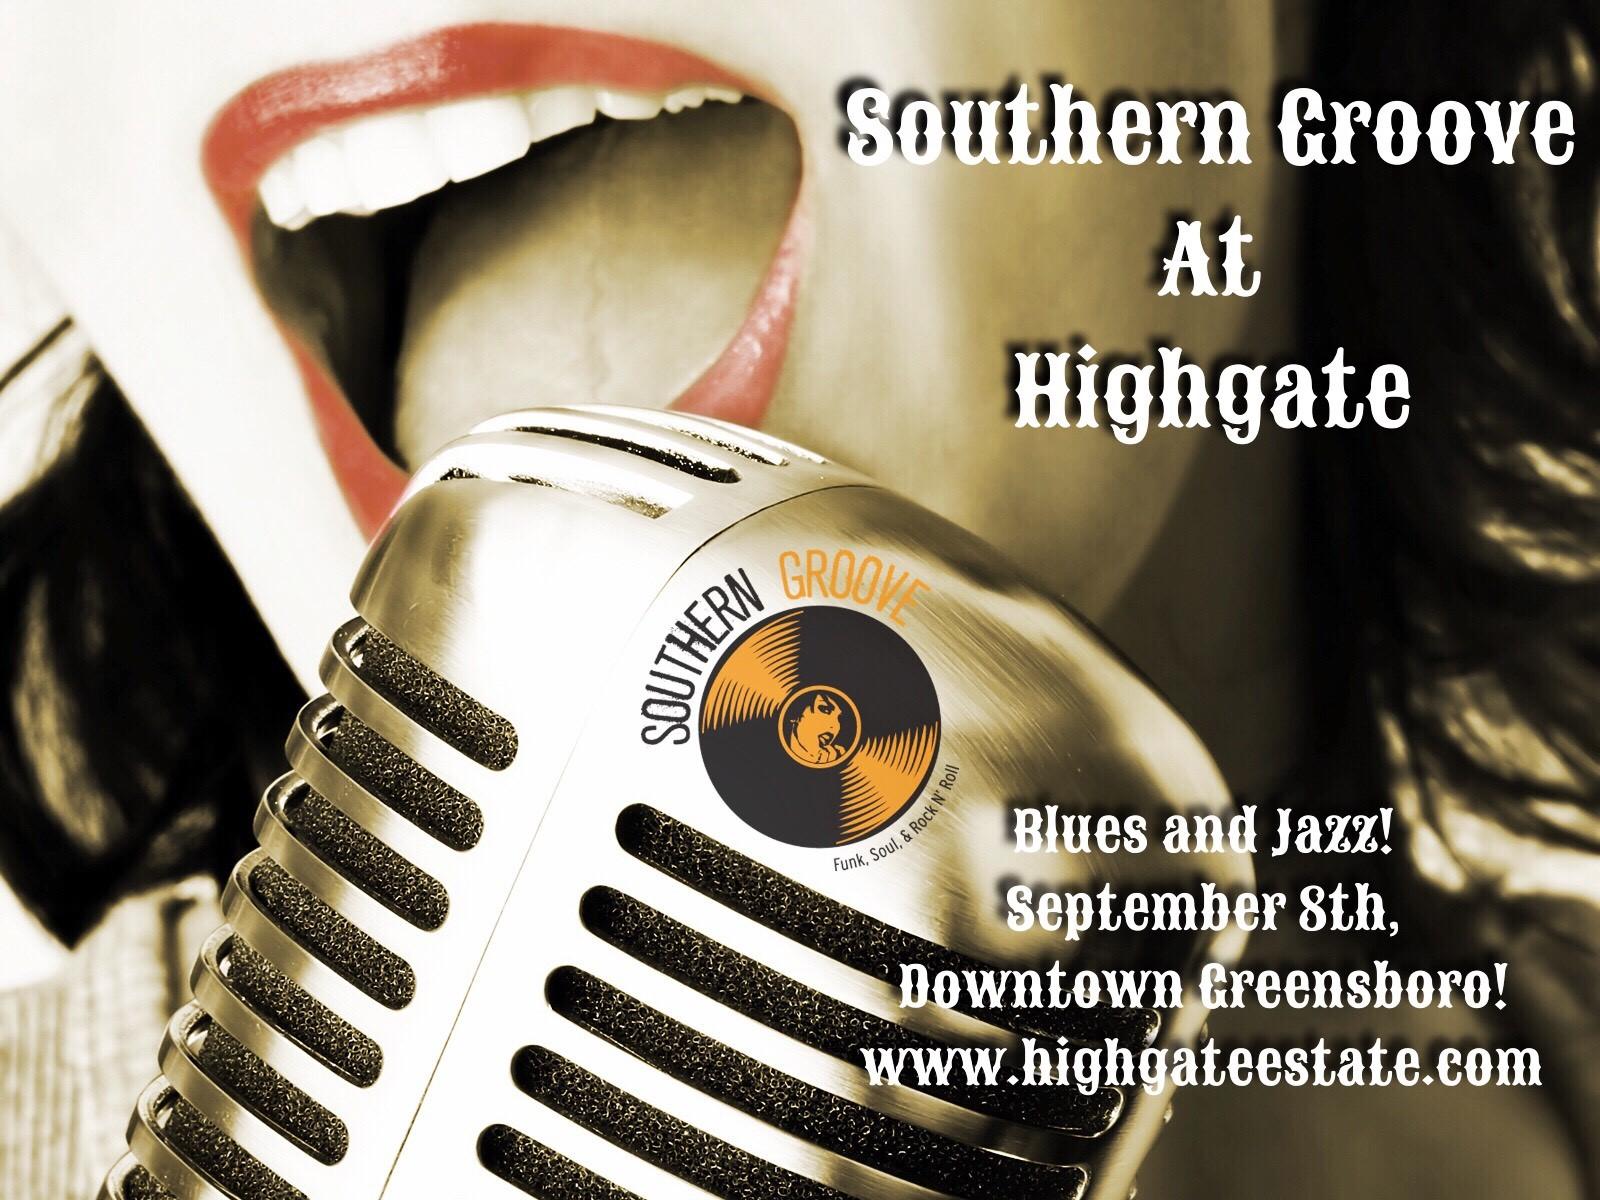 Southern Groove at Highgate |LakeOconeeLife.com